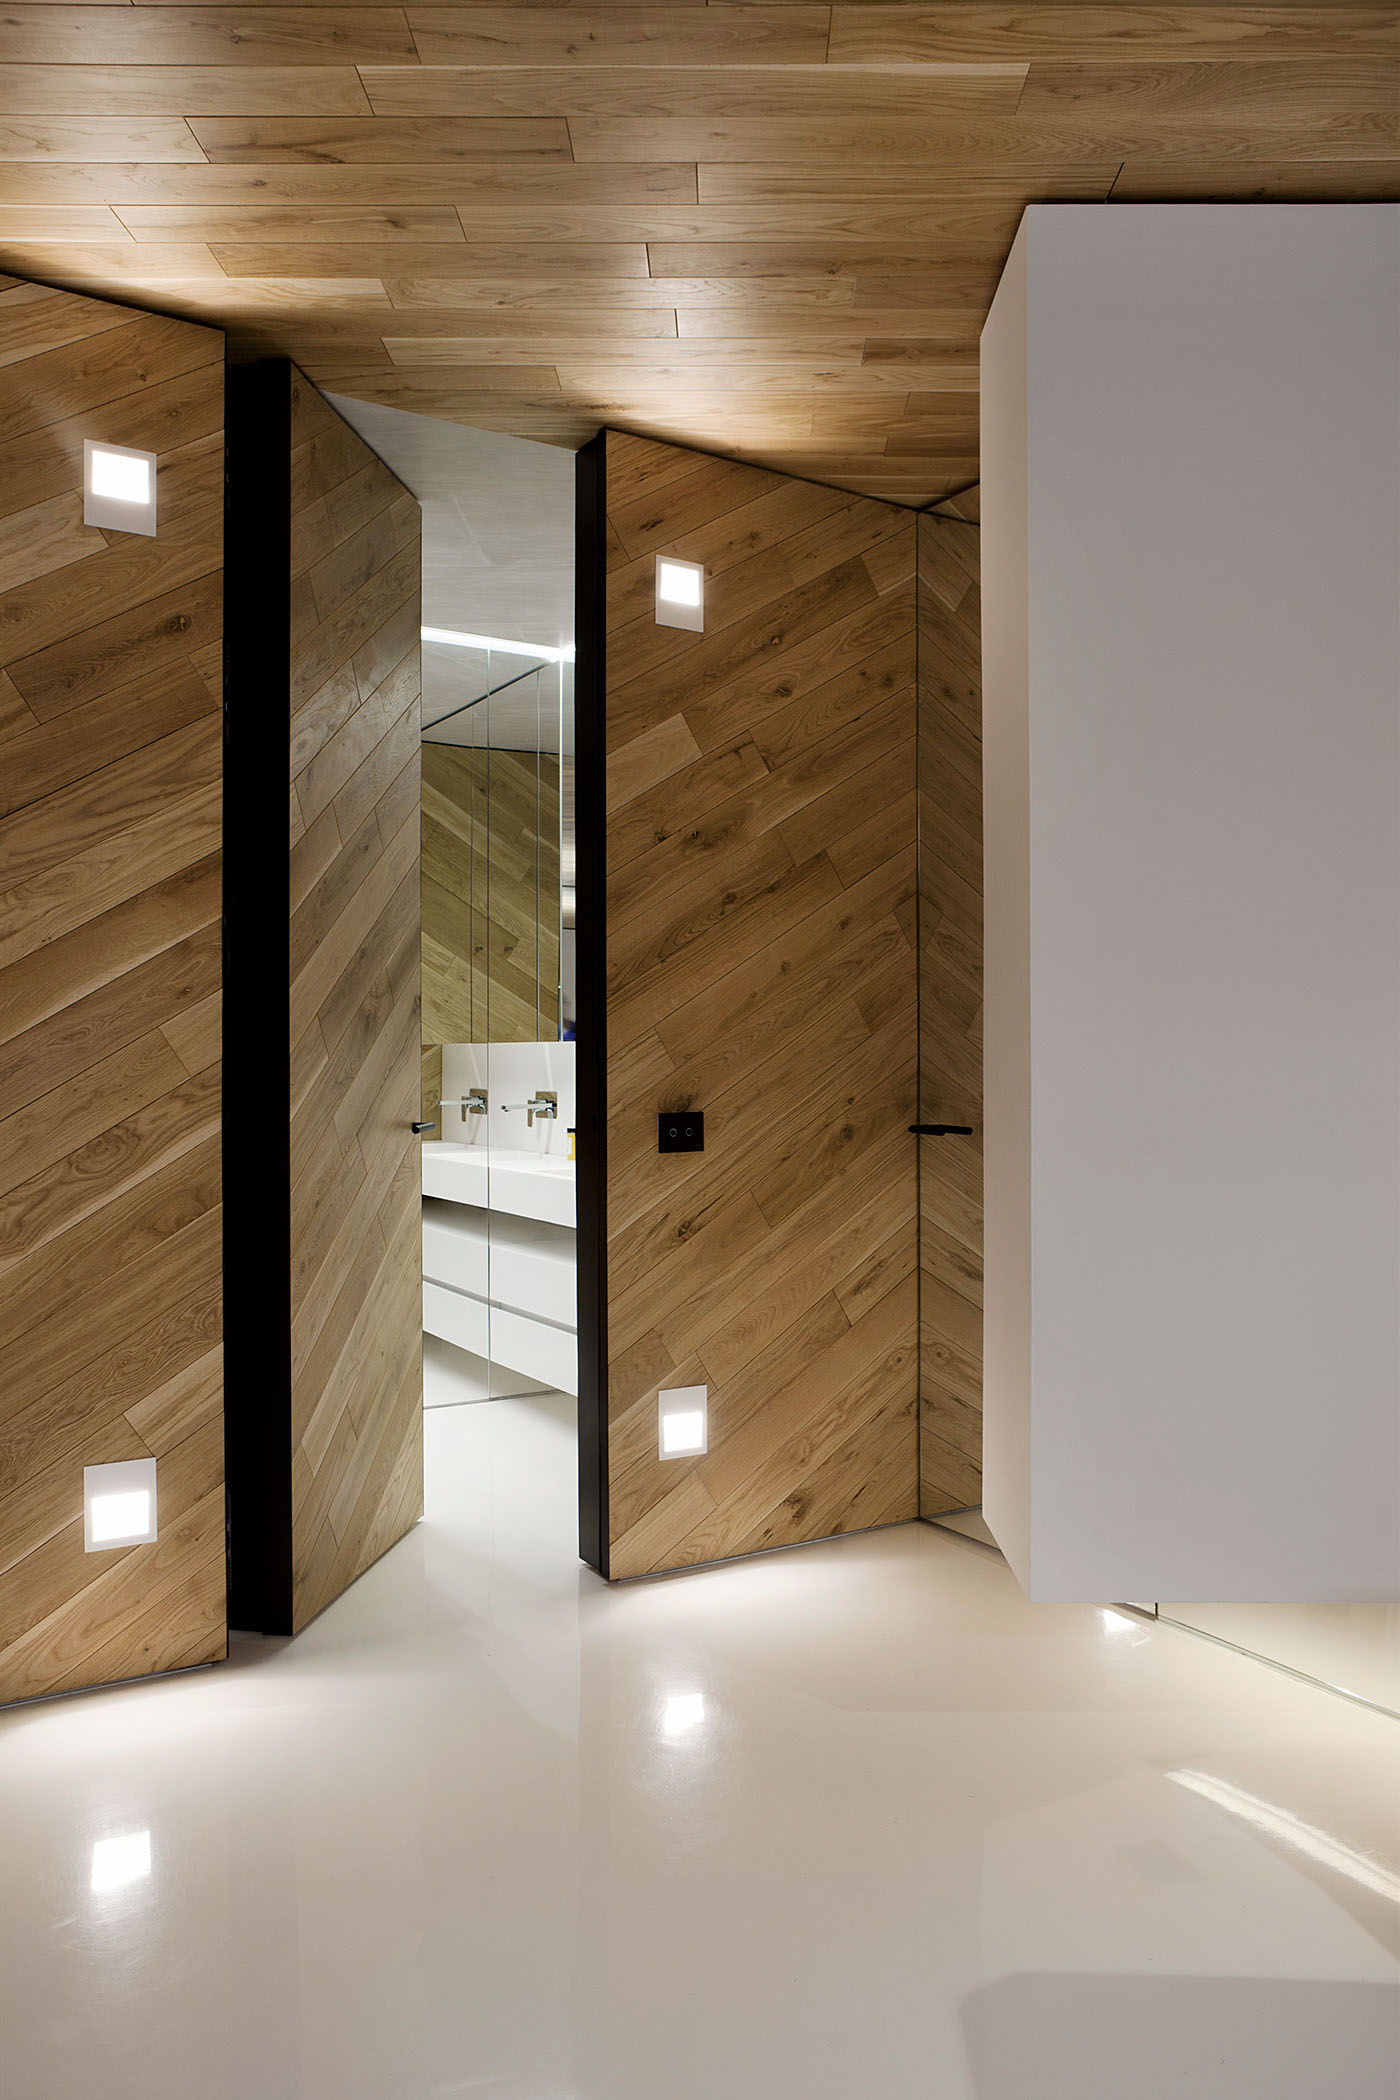 studio mode12 Loft Apartment By Studio Mode